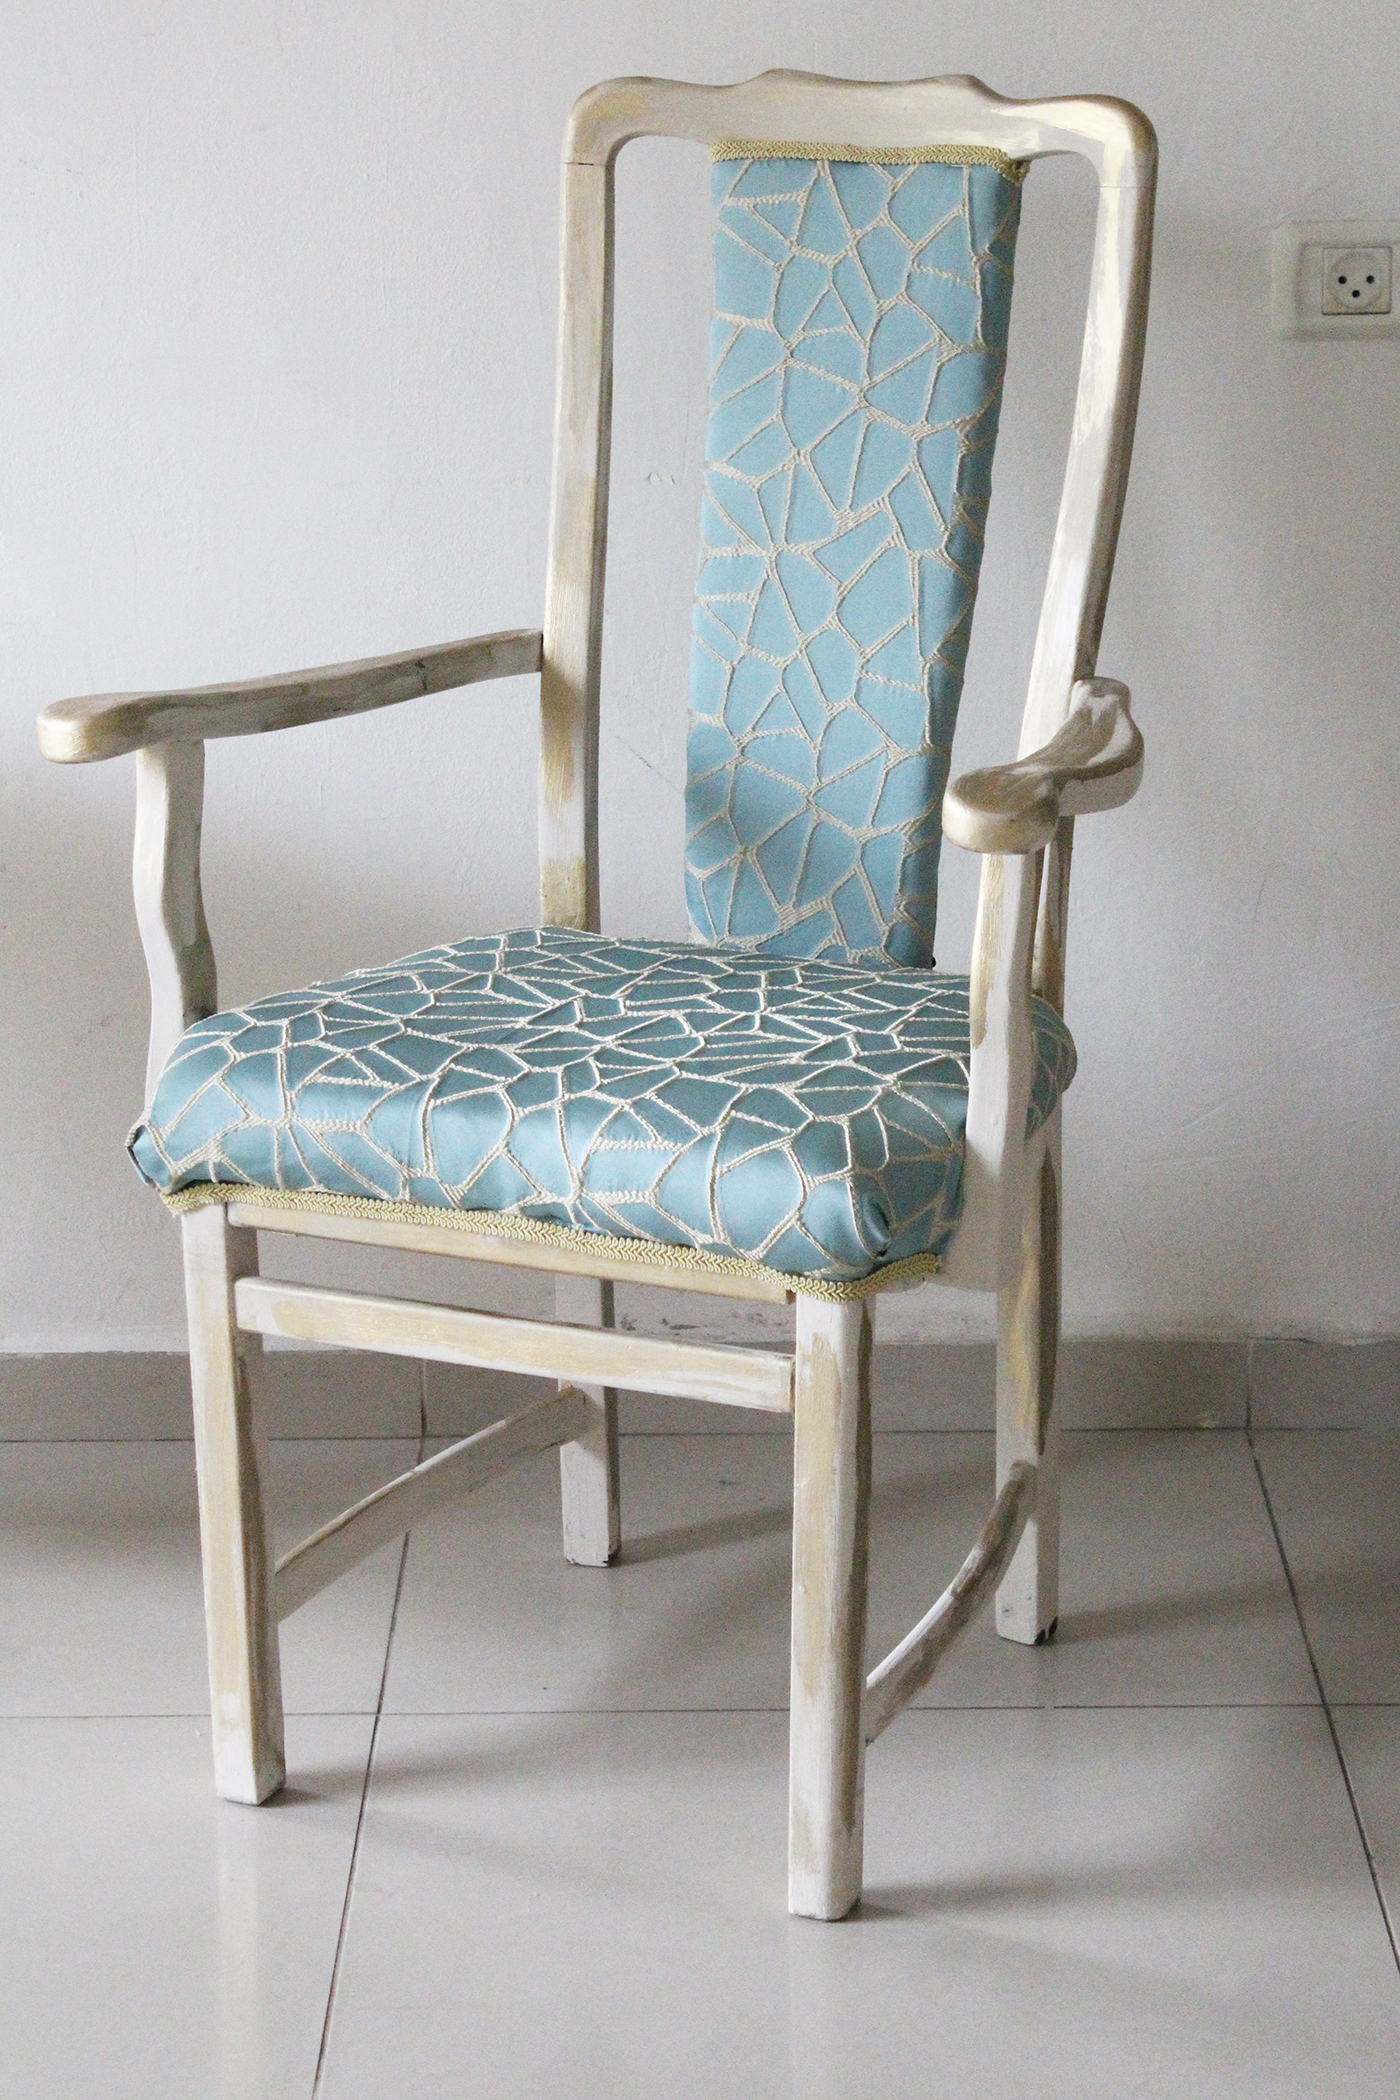 IMG 7664 - חידוש כסא לסט הסלוני